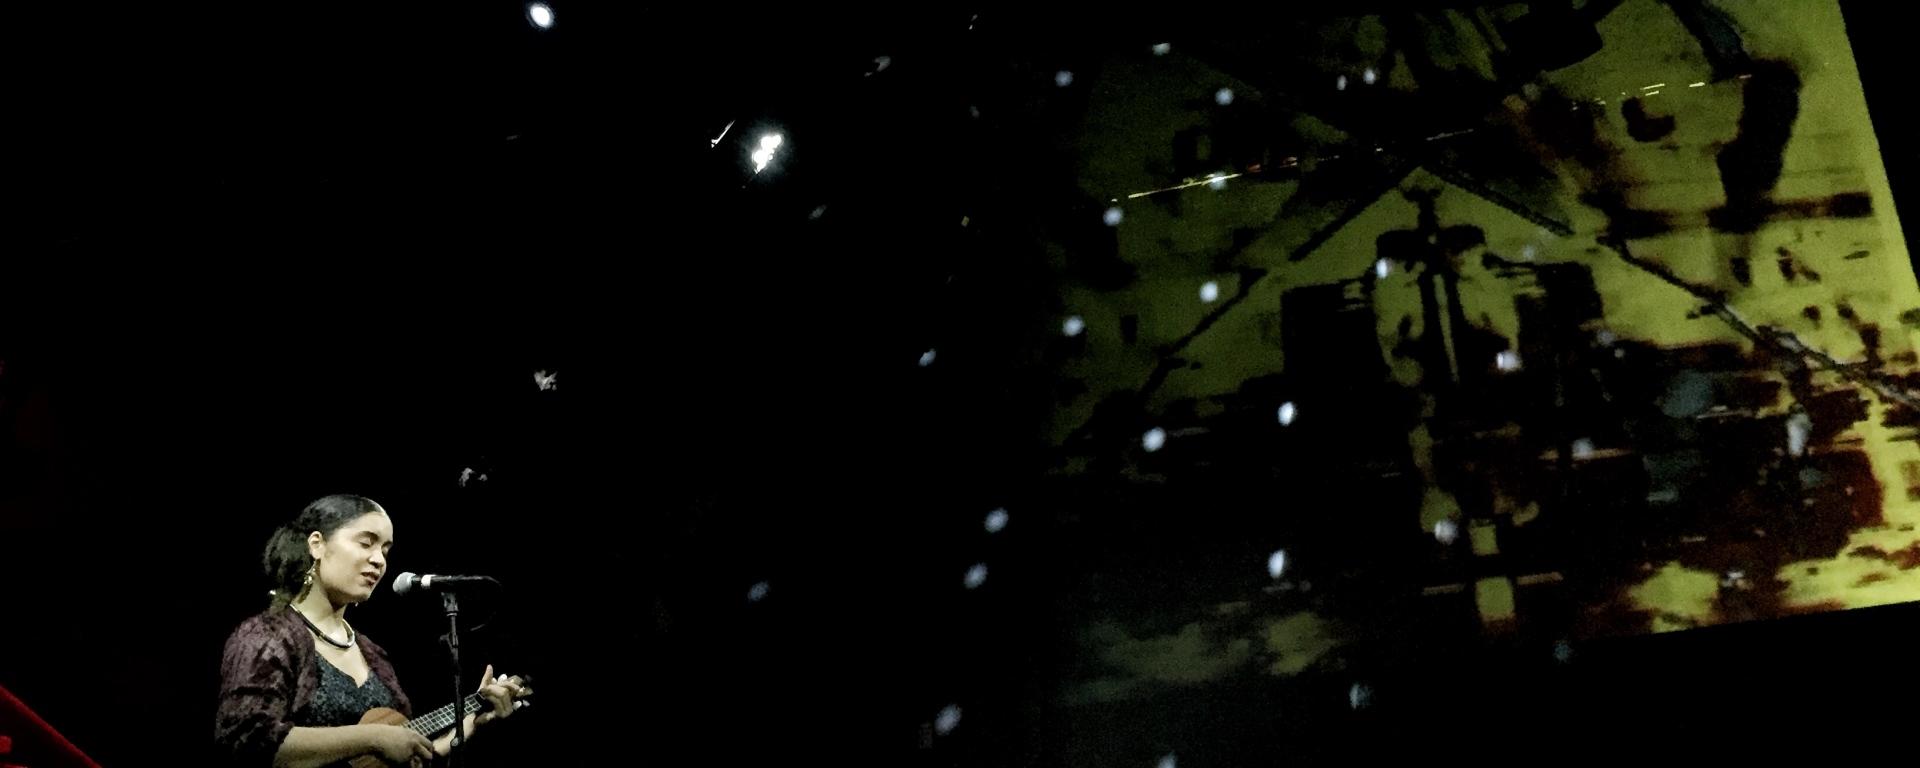 Daphné essiet performing at Nublu on Jan 6th 2018